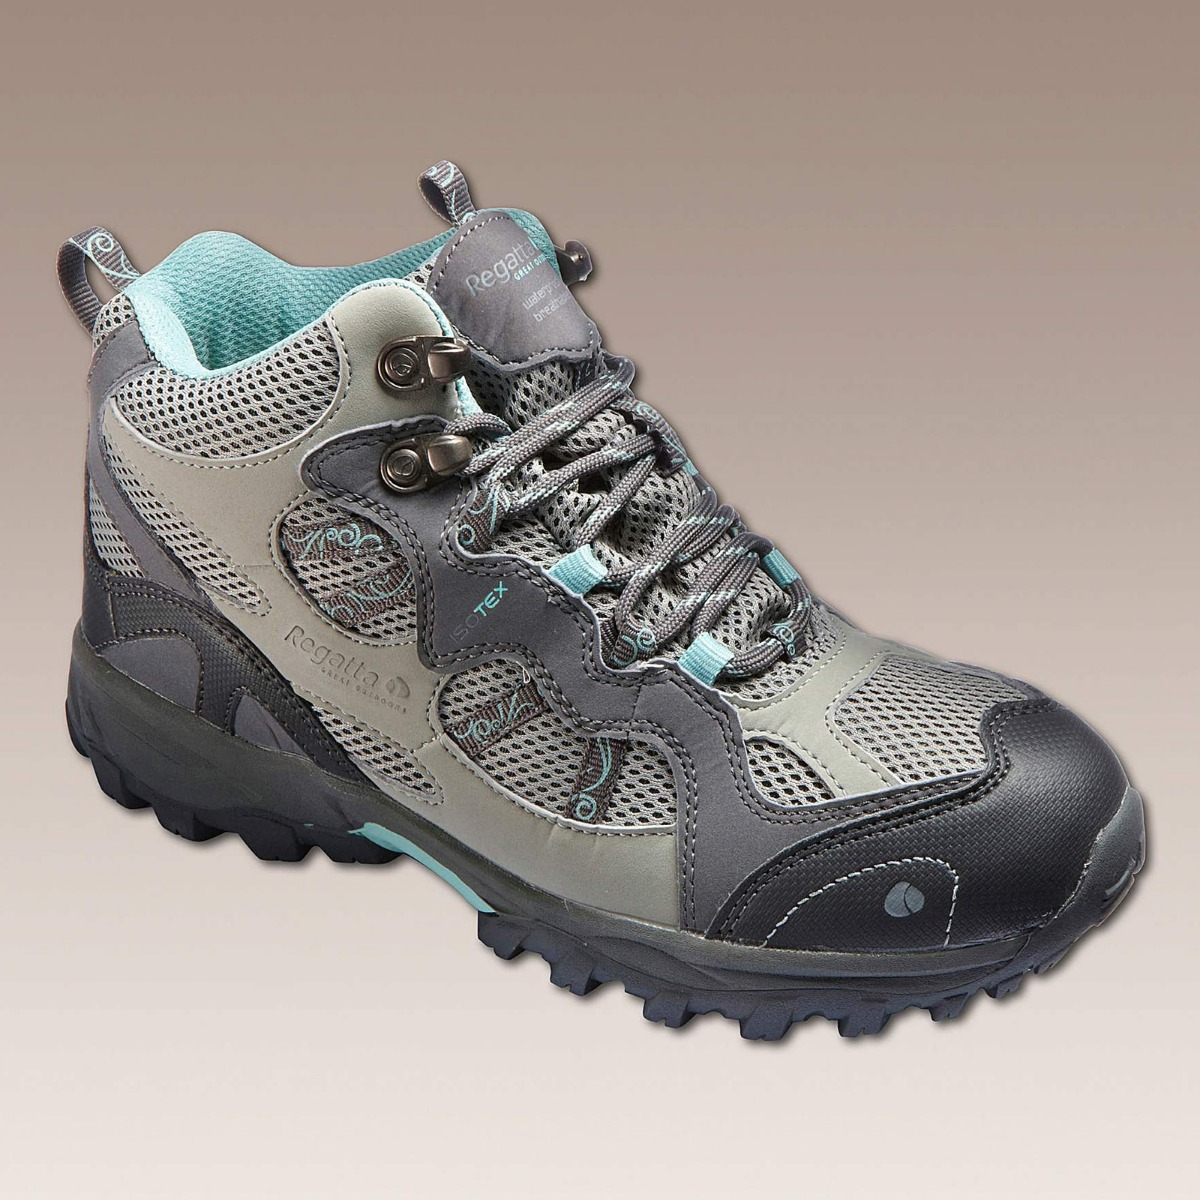 ba5c673a89000f REGATTA Ladies Womens Walking Hiking Boots Shoes Waterproof Size 3 ...